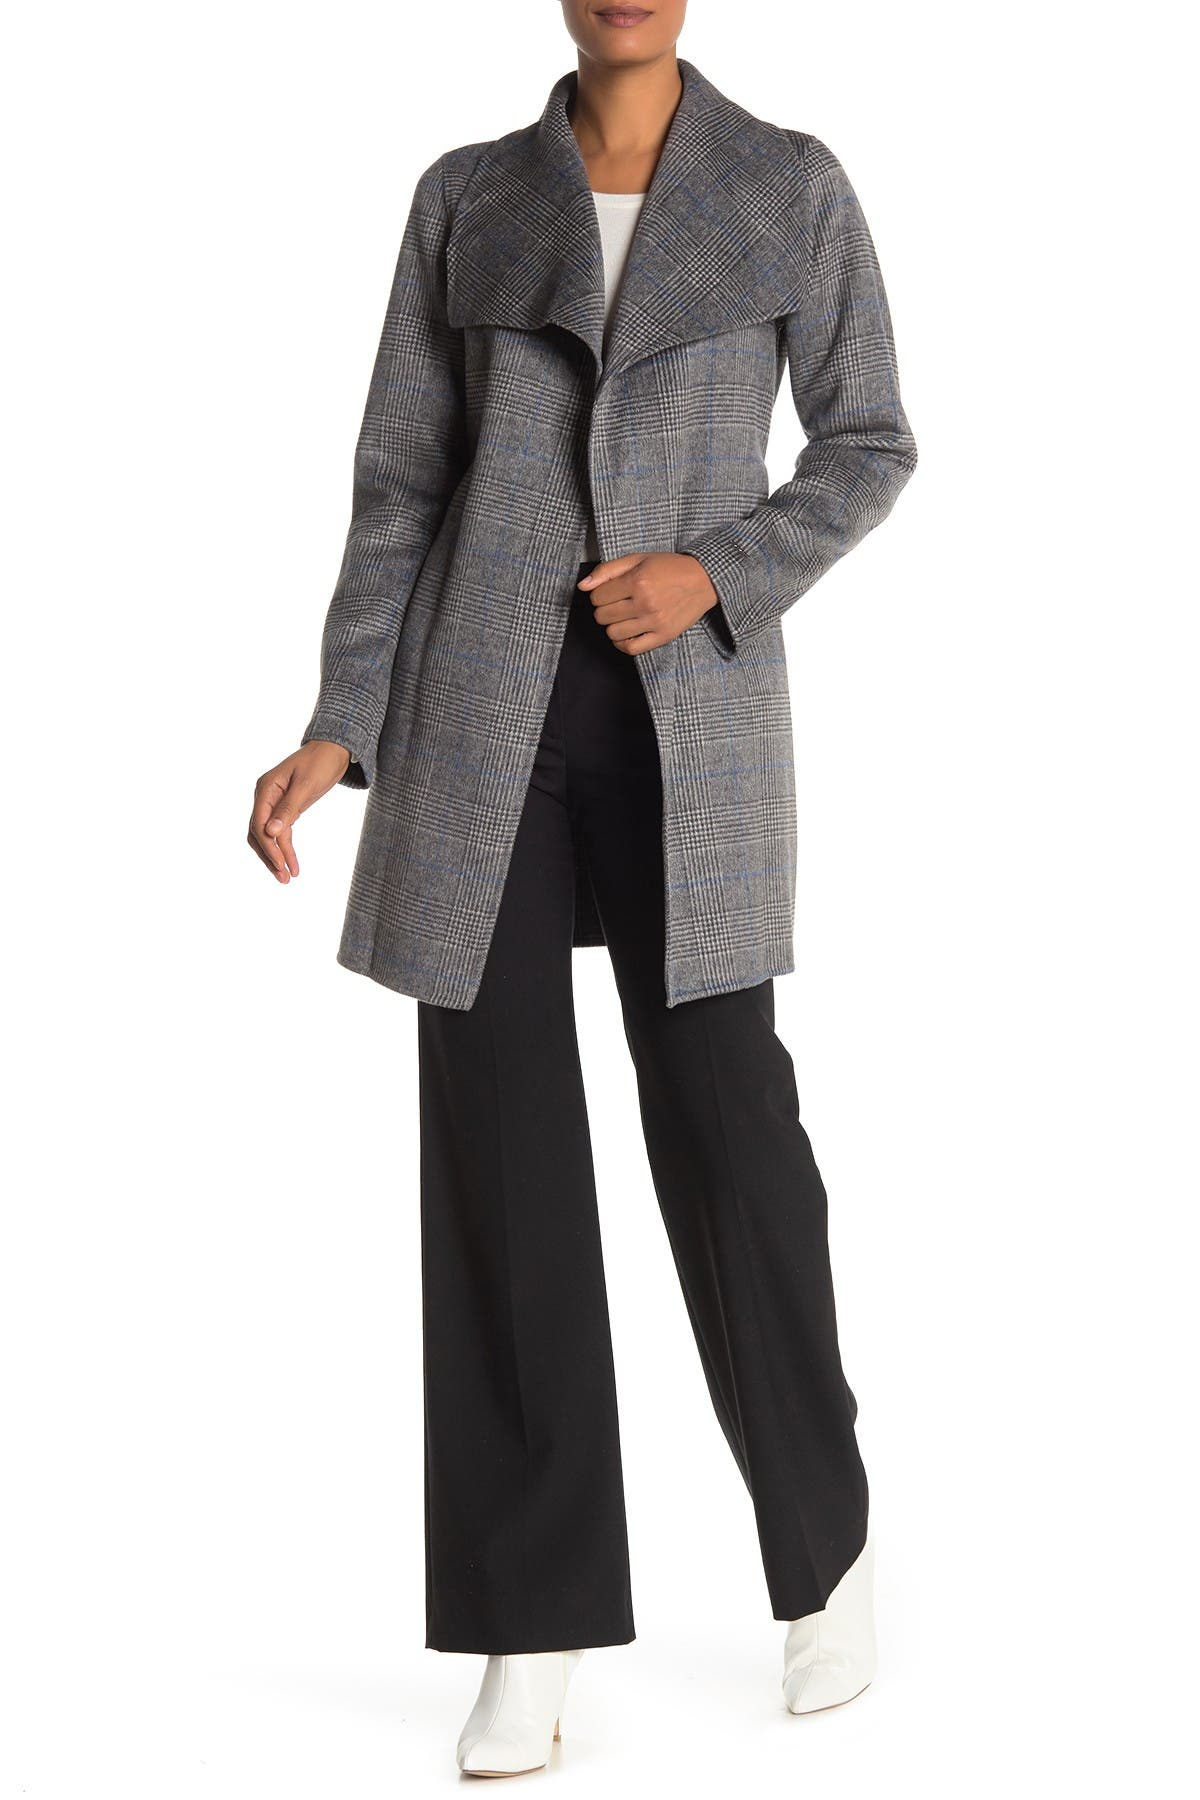 Image of Tahari Ella Novelty Plaid Print Wool Blend Coat